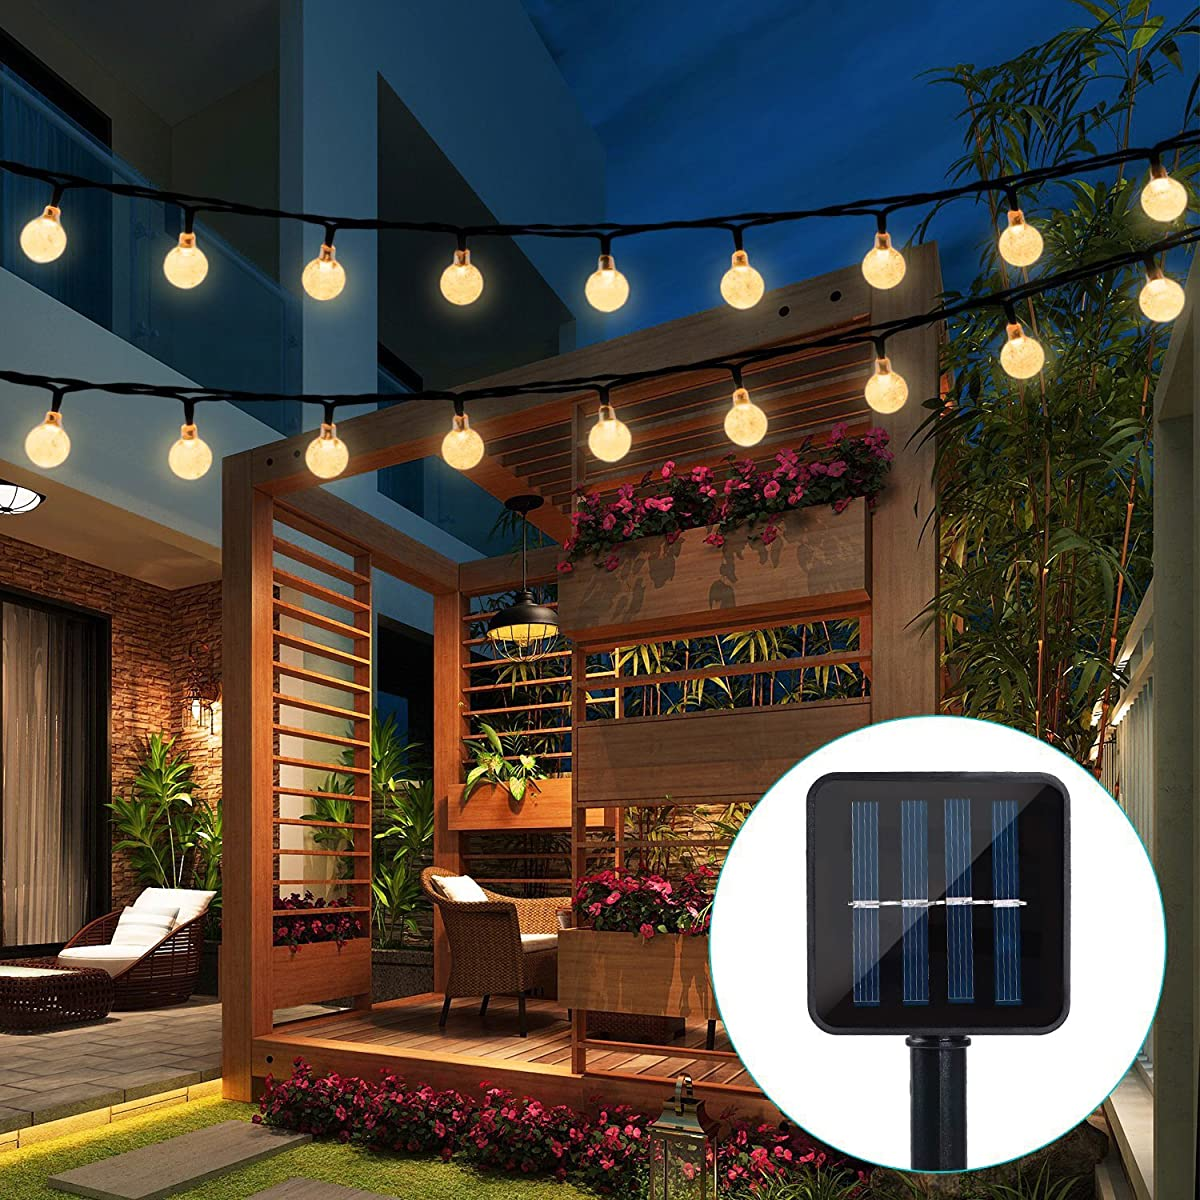 Globe String Lights, CMYK 20 Ft 30 Crystal Balls Waterproof LED Fairy Lights, Outdoor Starry Lights Solar Powered String Lights, Decorative Lighting for Home, Garden, Party, Festival (Warm White)